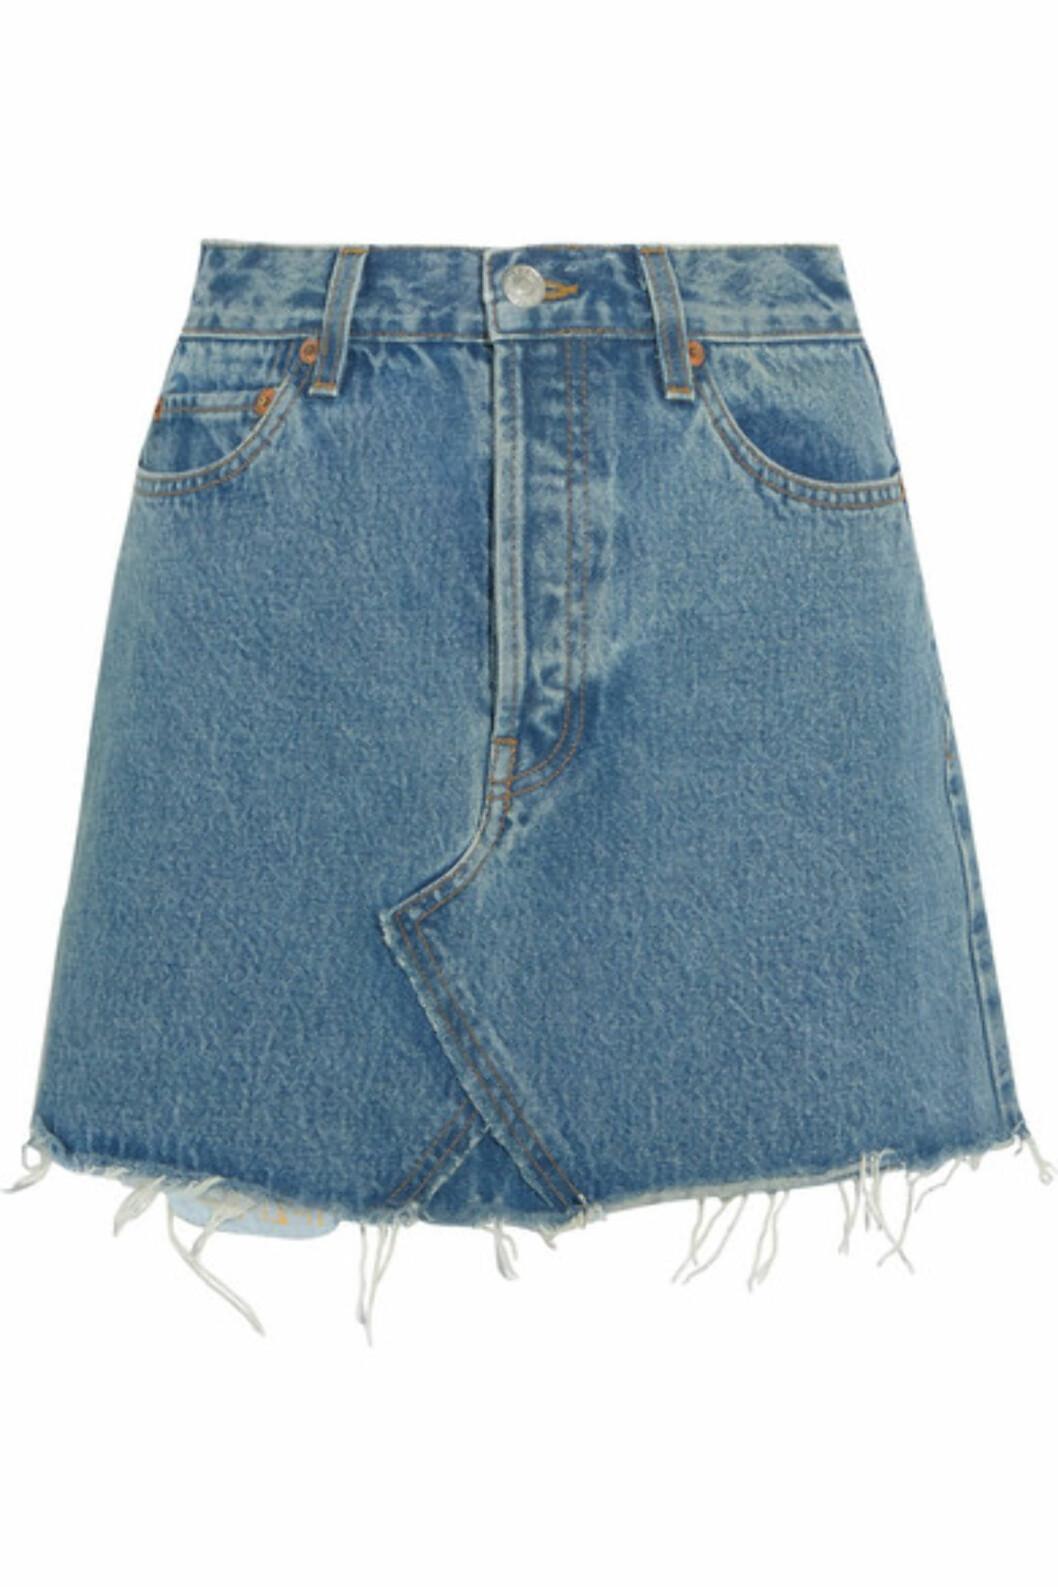 <strong>Skjørt fra Re/Done |2600,-| https:</strong>//www.net-a-porter.com/no/en/product/896805/re_done/originals-distressed-denim-mini-skirt